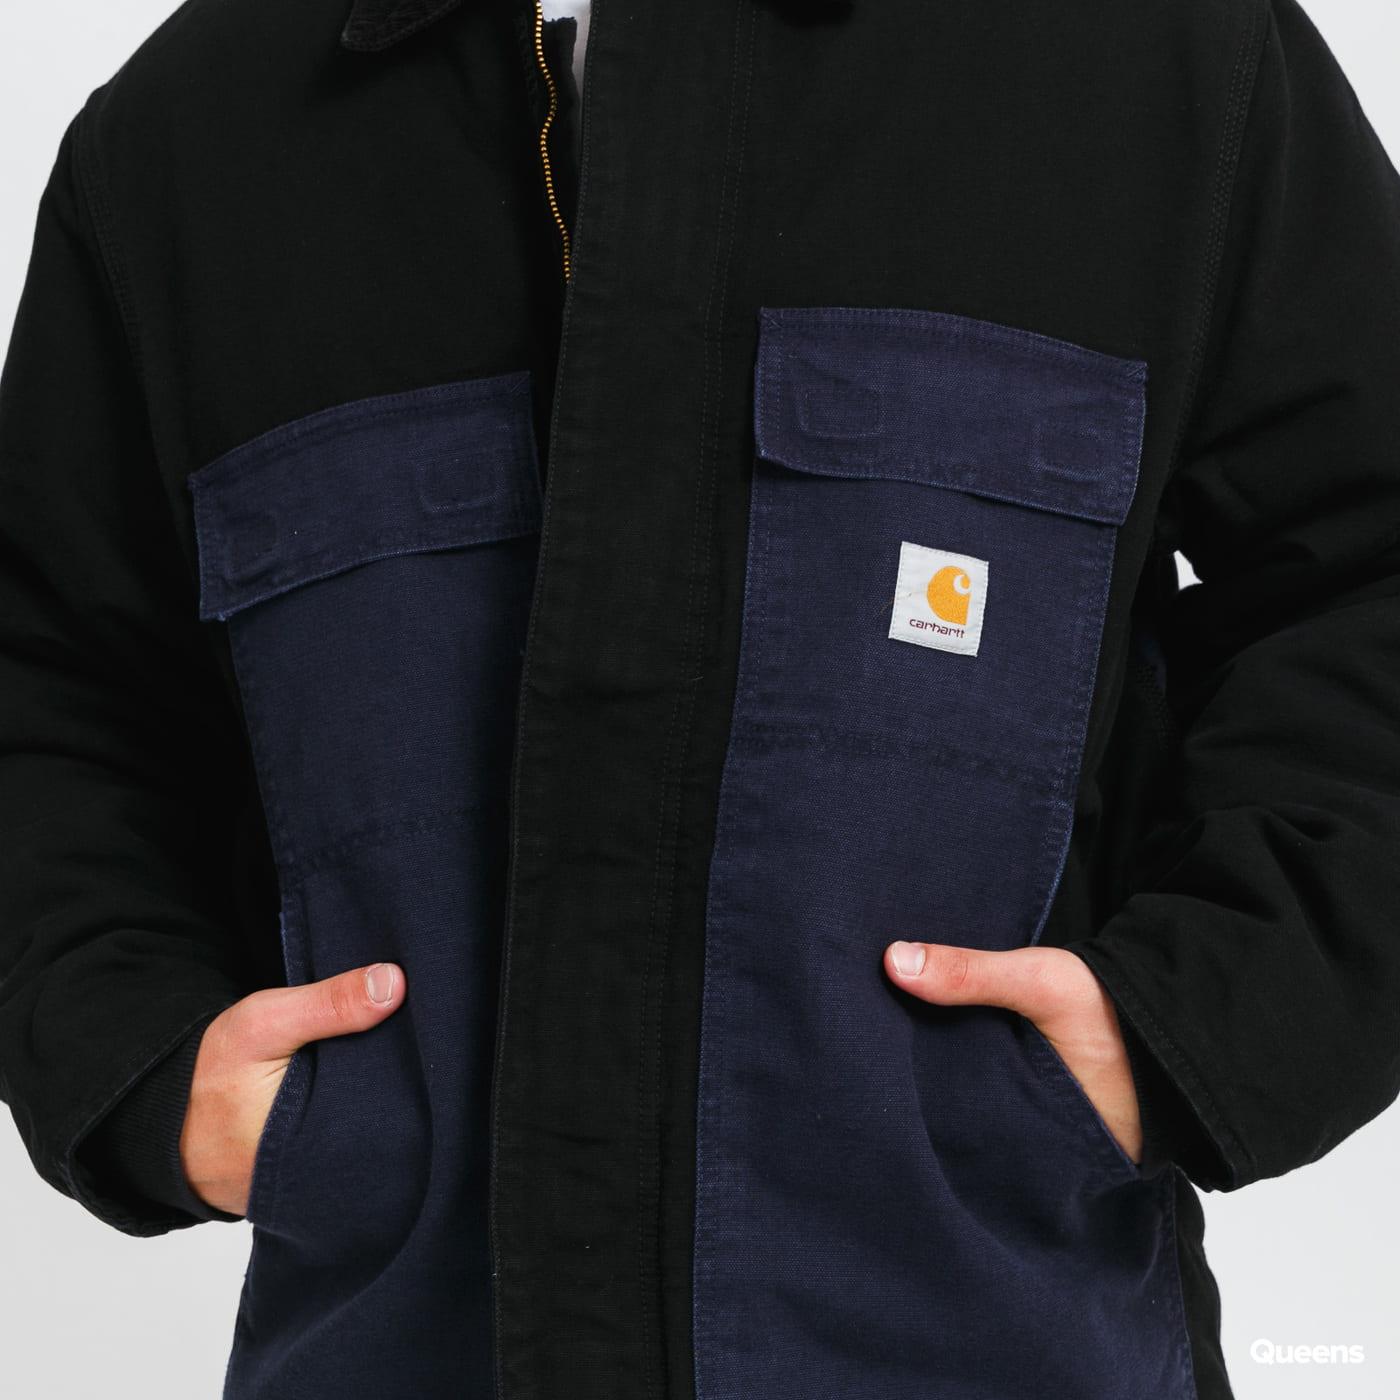 Carhartt WIP OG Arctic Coat black / navy